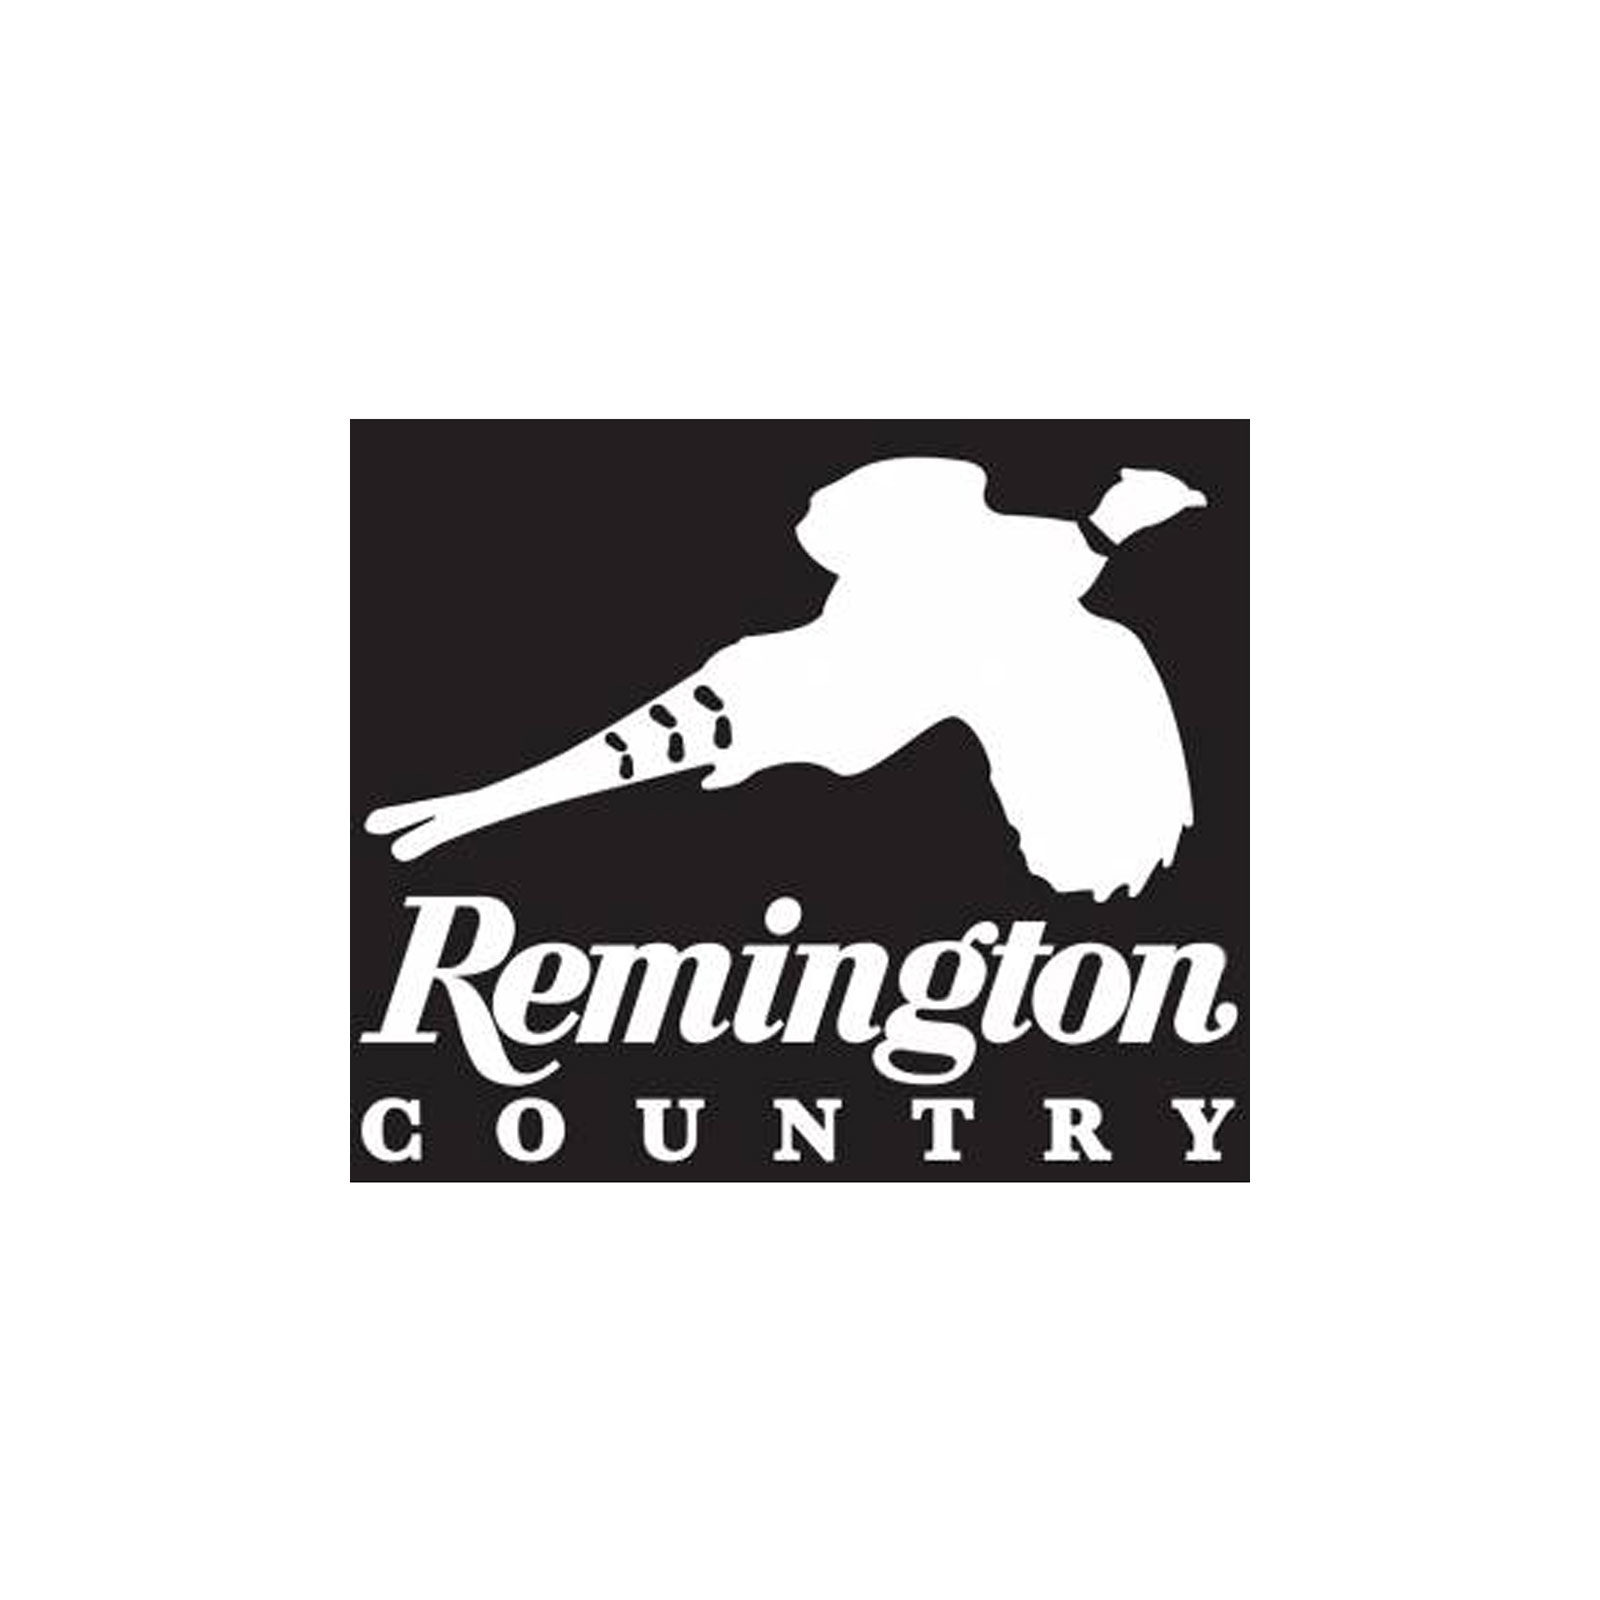 Remington Country 17416 White Die Cut Vinyl Decal Pheasant